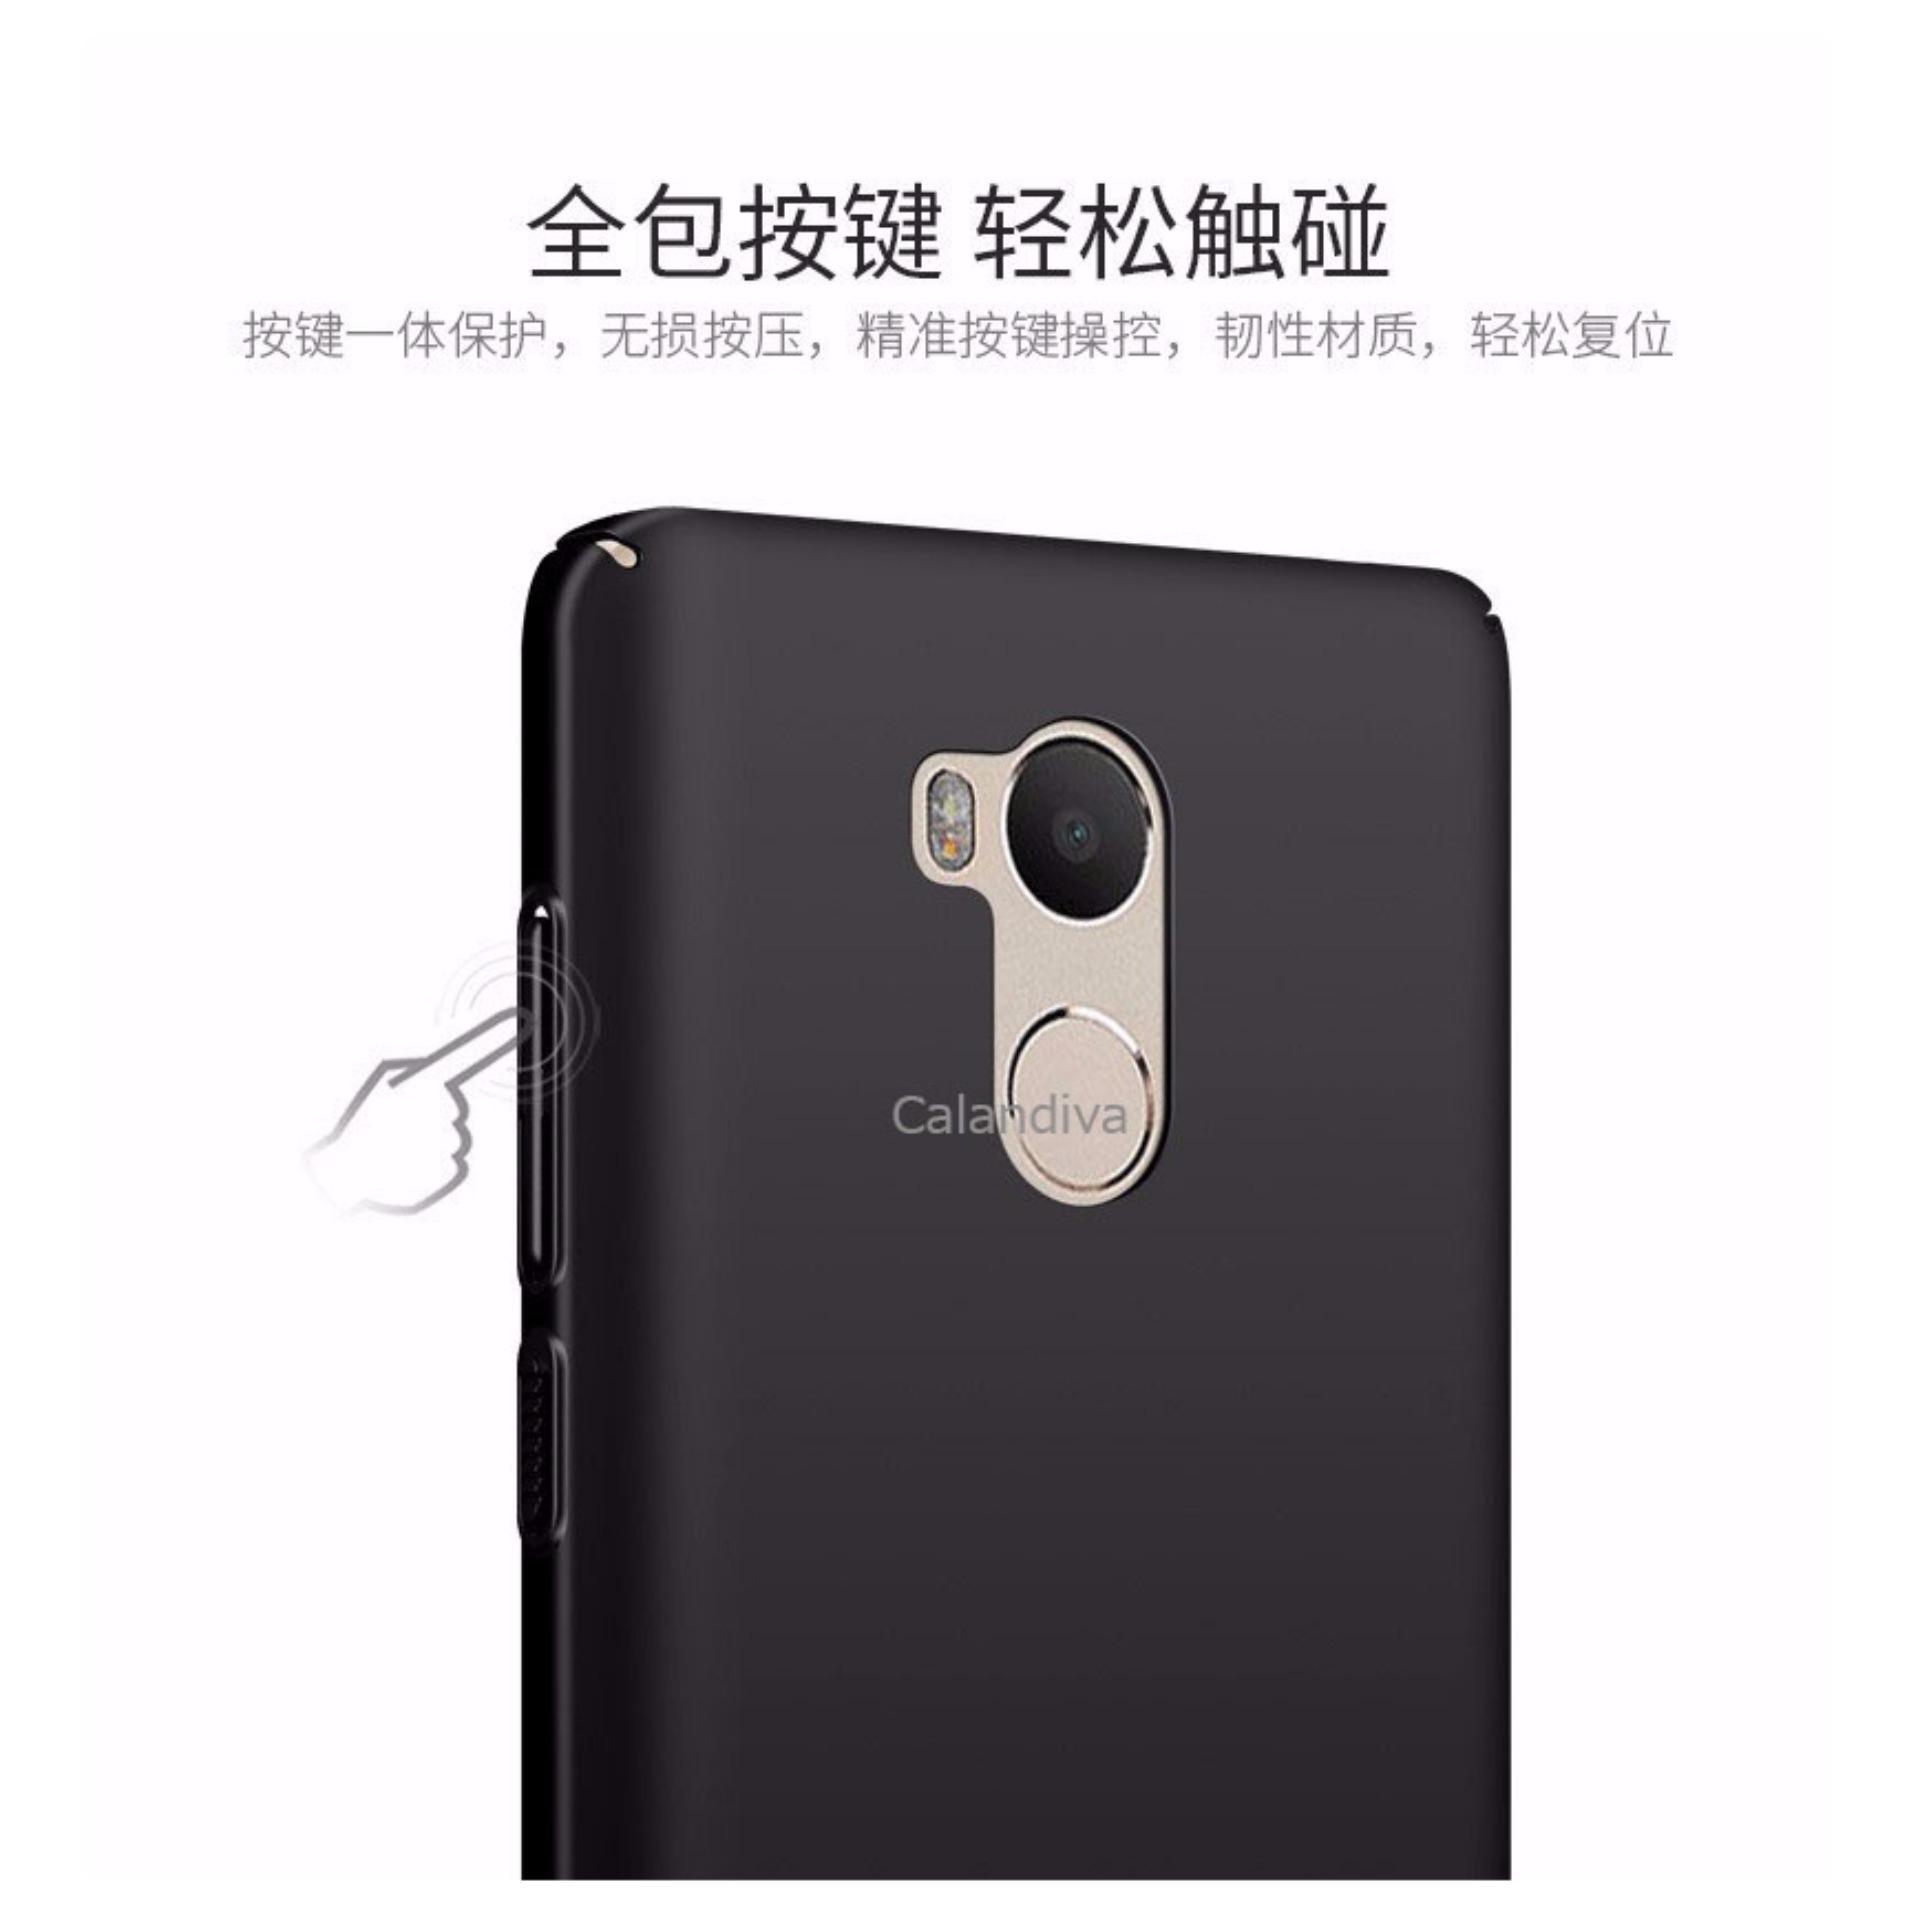 Calandiva 360 Degree Protection Case For Xiaomi Redmi 4 Black Spec S2 Hardcase Full Protective Slim 4s Prime Pro